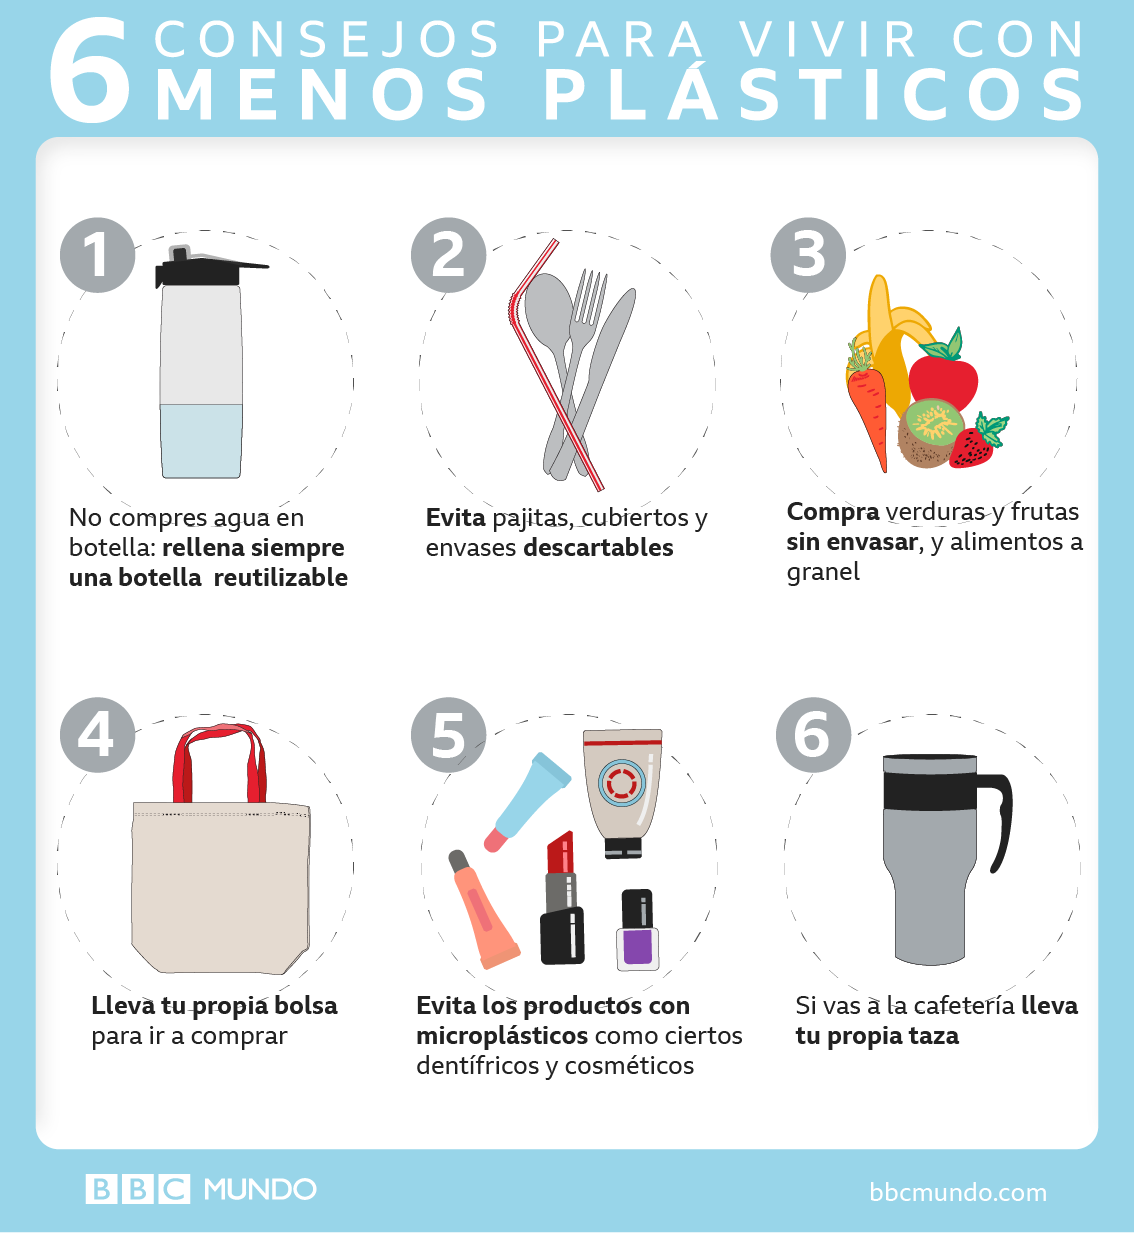 Gráfico para usar menos plásticos